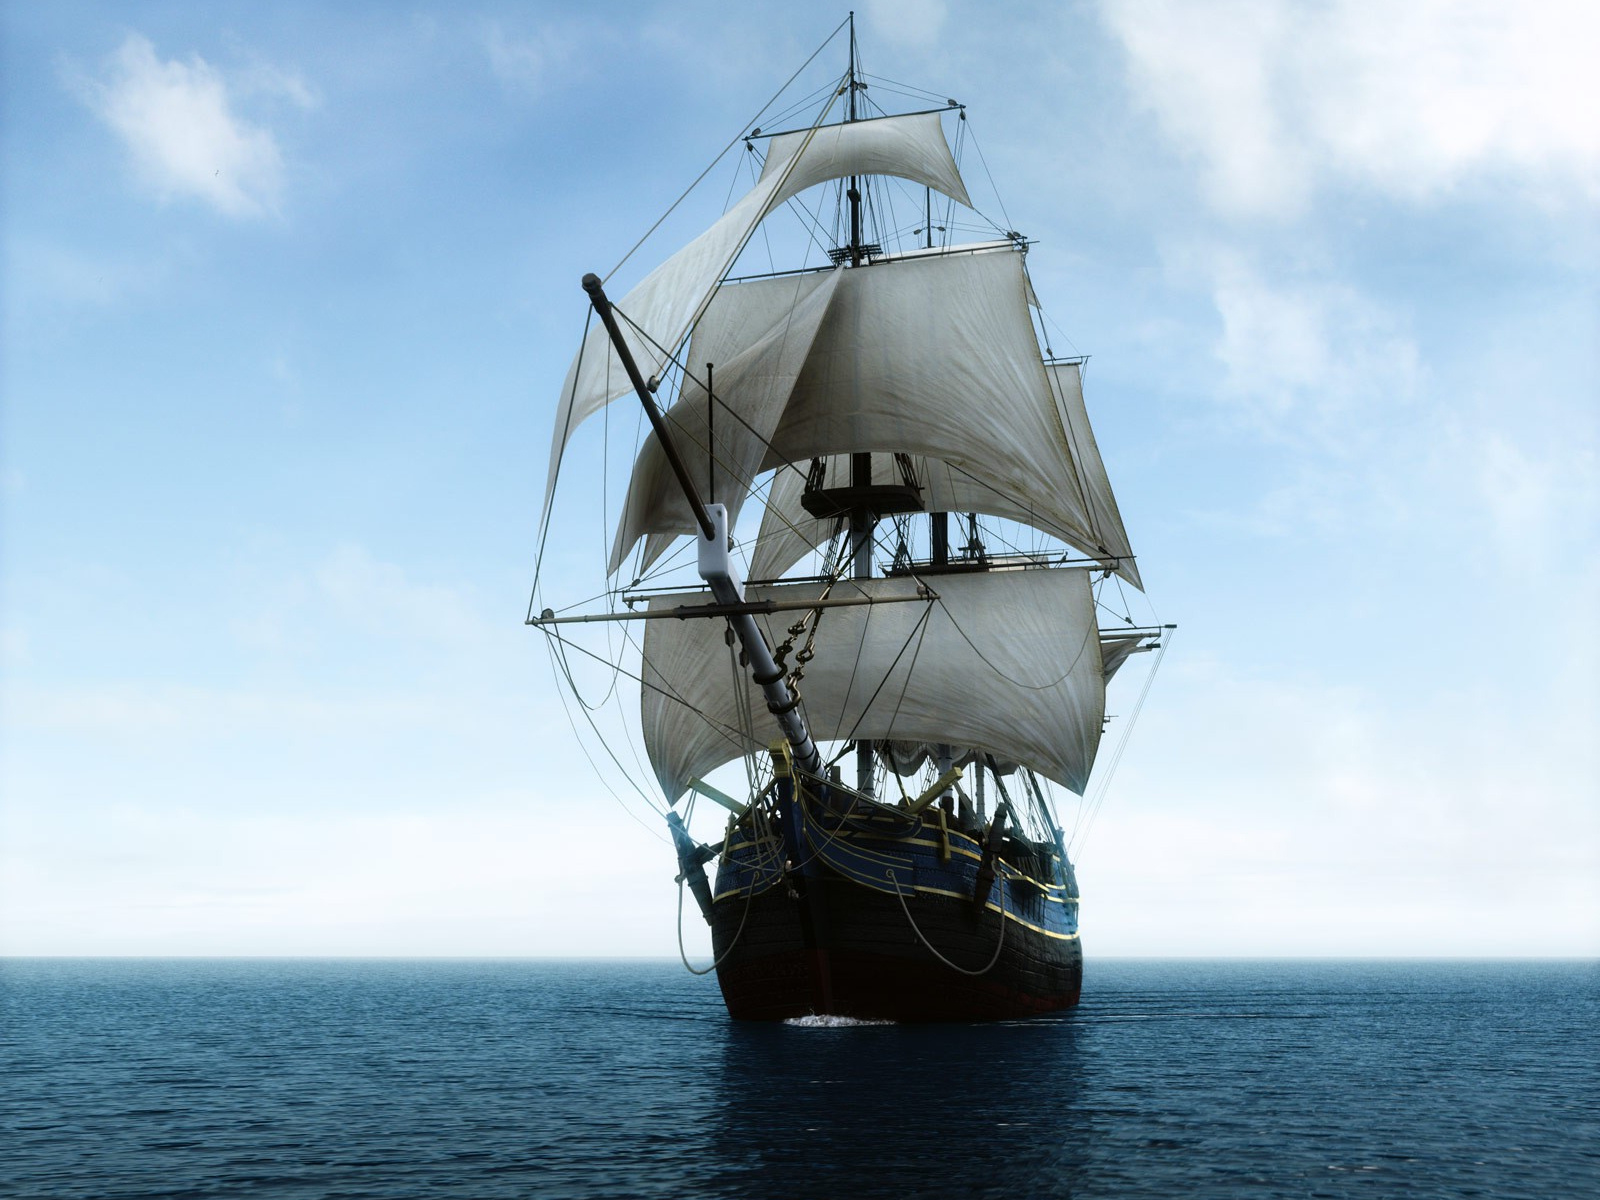 http://3.bp.blogspot.com/_Iq1fkO6qus0/TRe60JuePsI/AAAAAAAAAYE/QrN4B7lSo4U/s1600/Ship-Wallpapers_2612201001.jpg